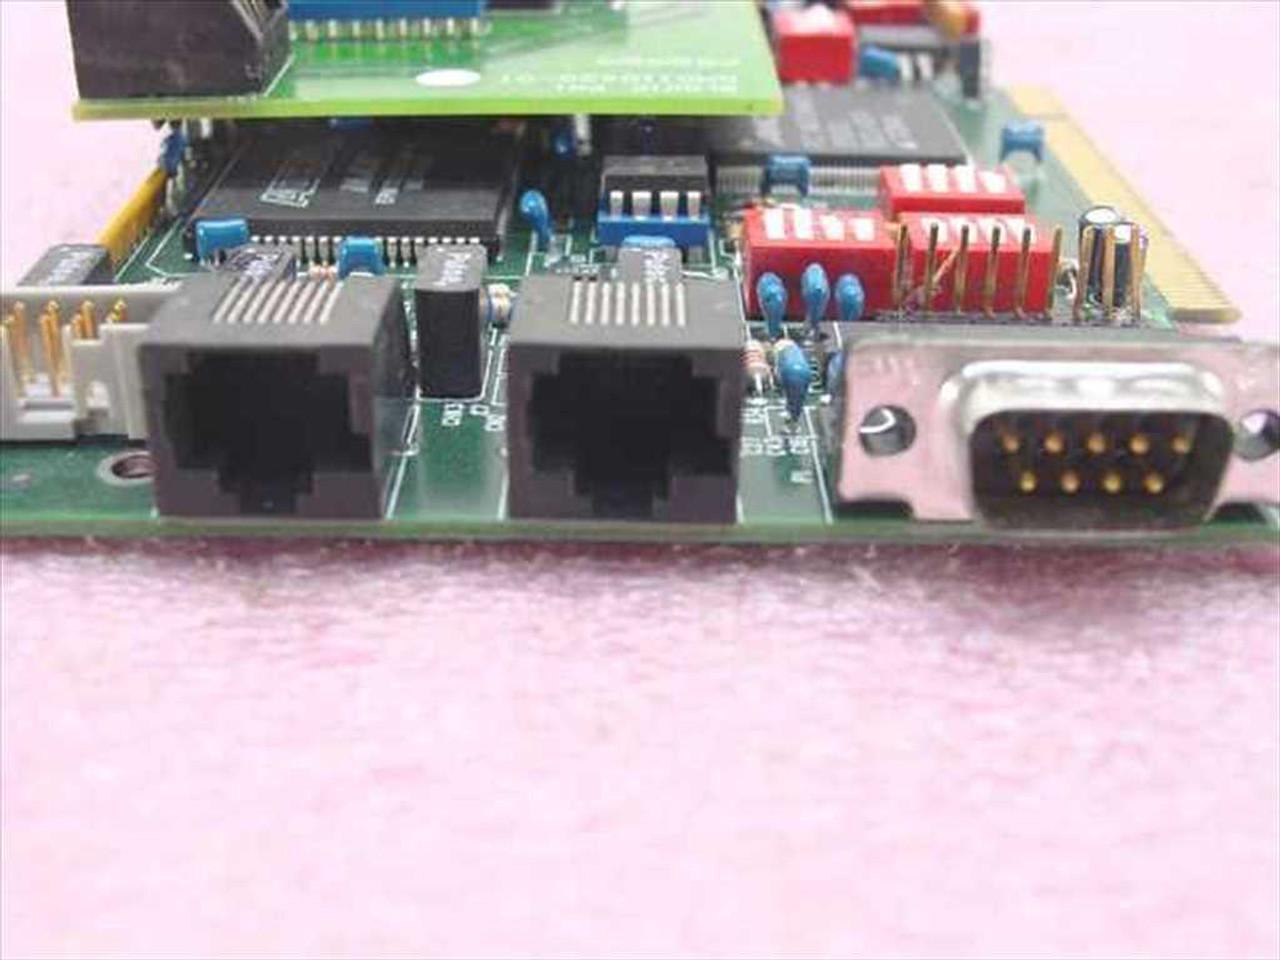 AMCC PCI MATCHMAKER S5920Q WINDOWS 7 DRIVERS DOWNLOAD